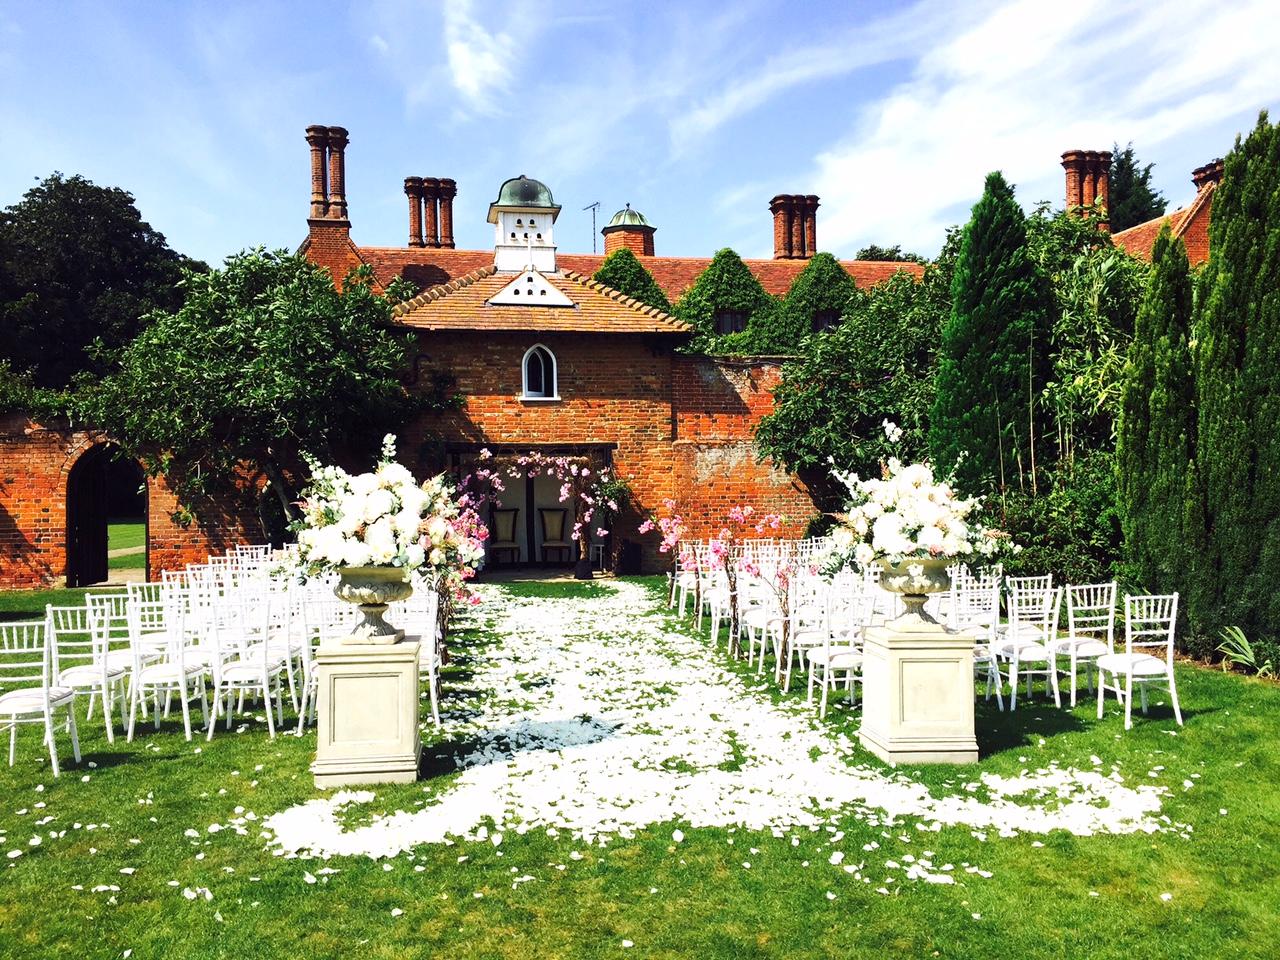 rmw rates woodhall manor